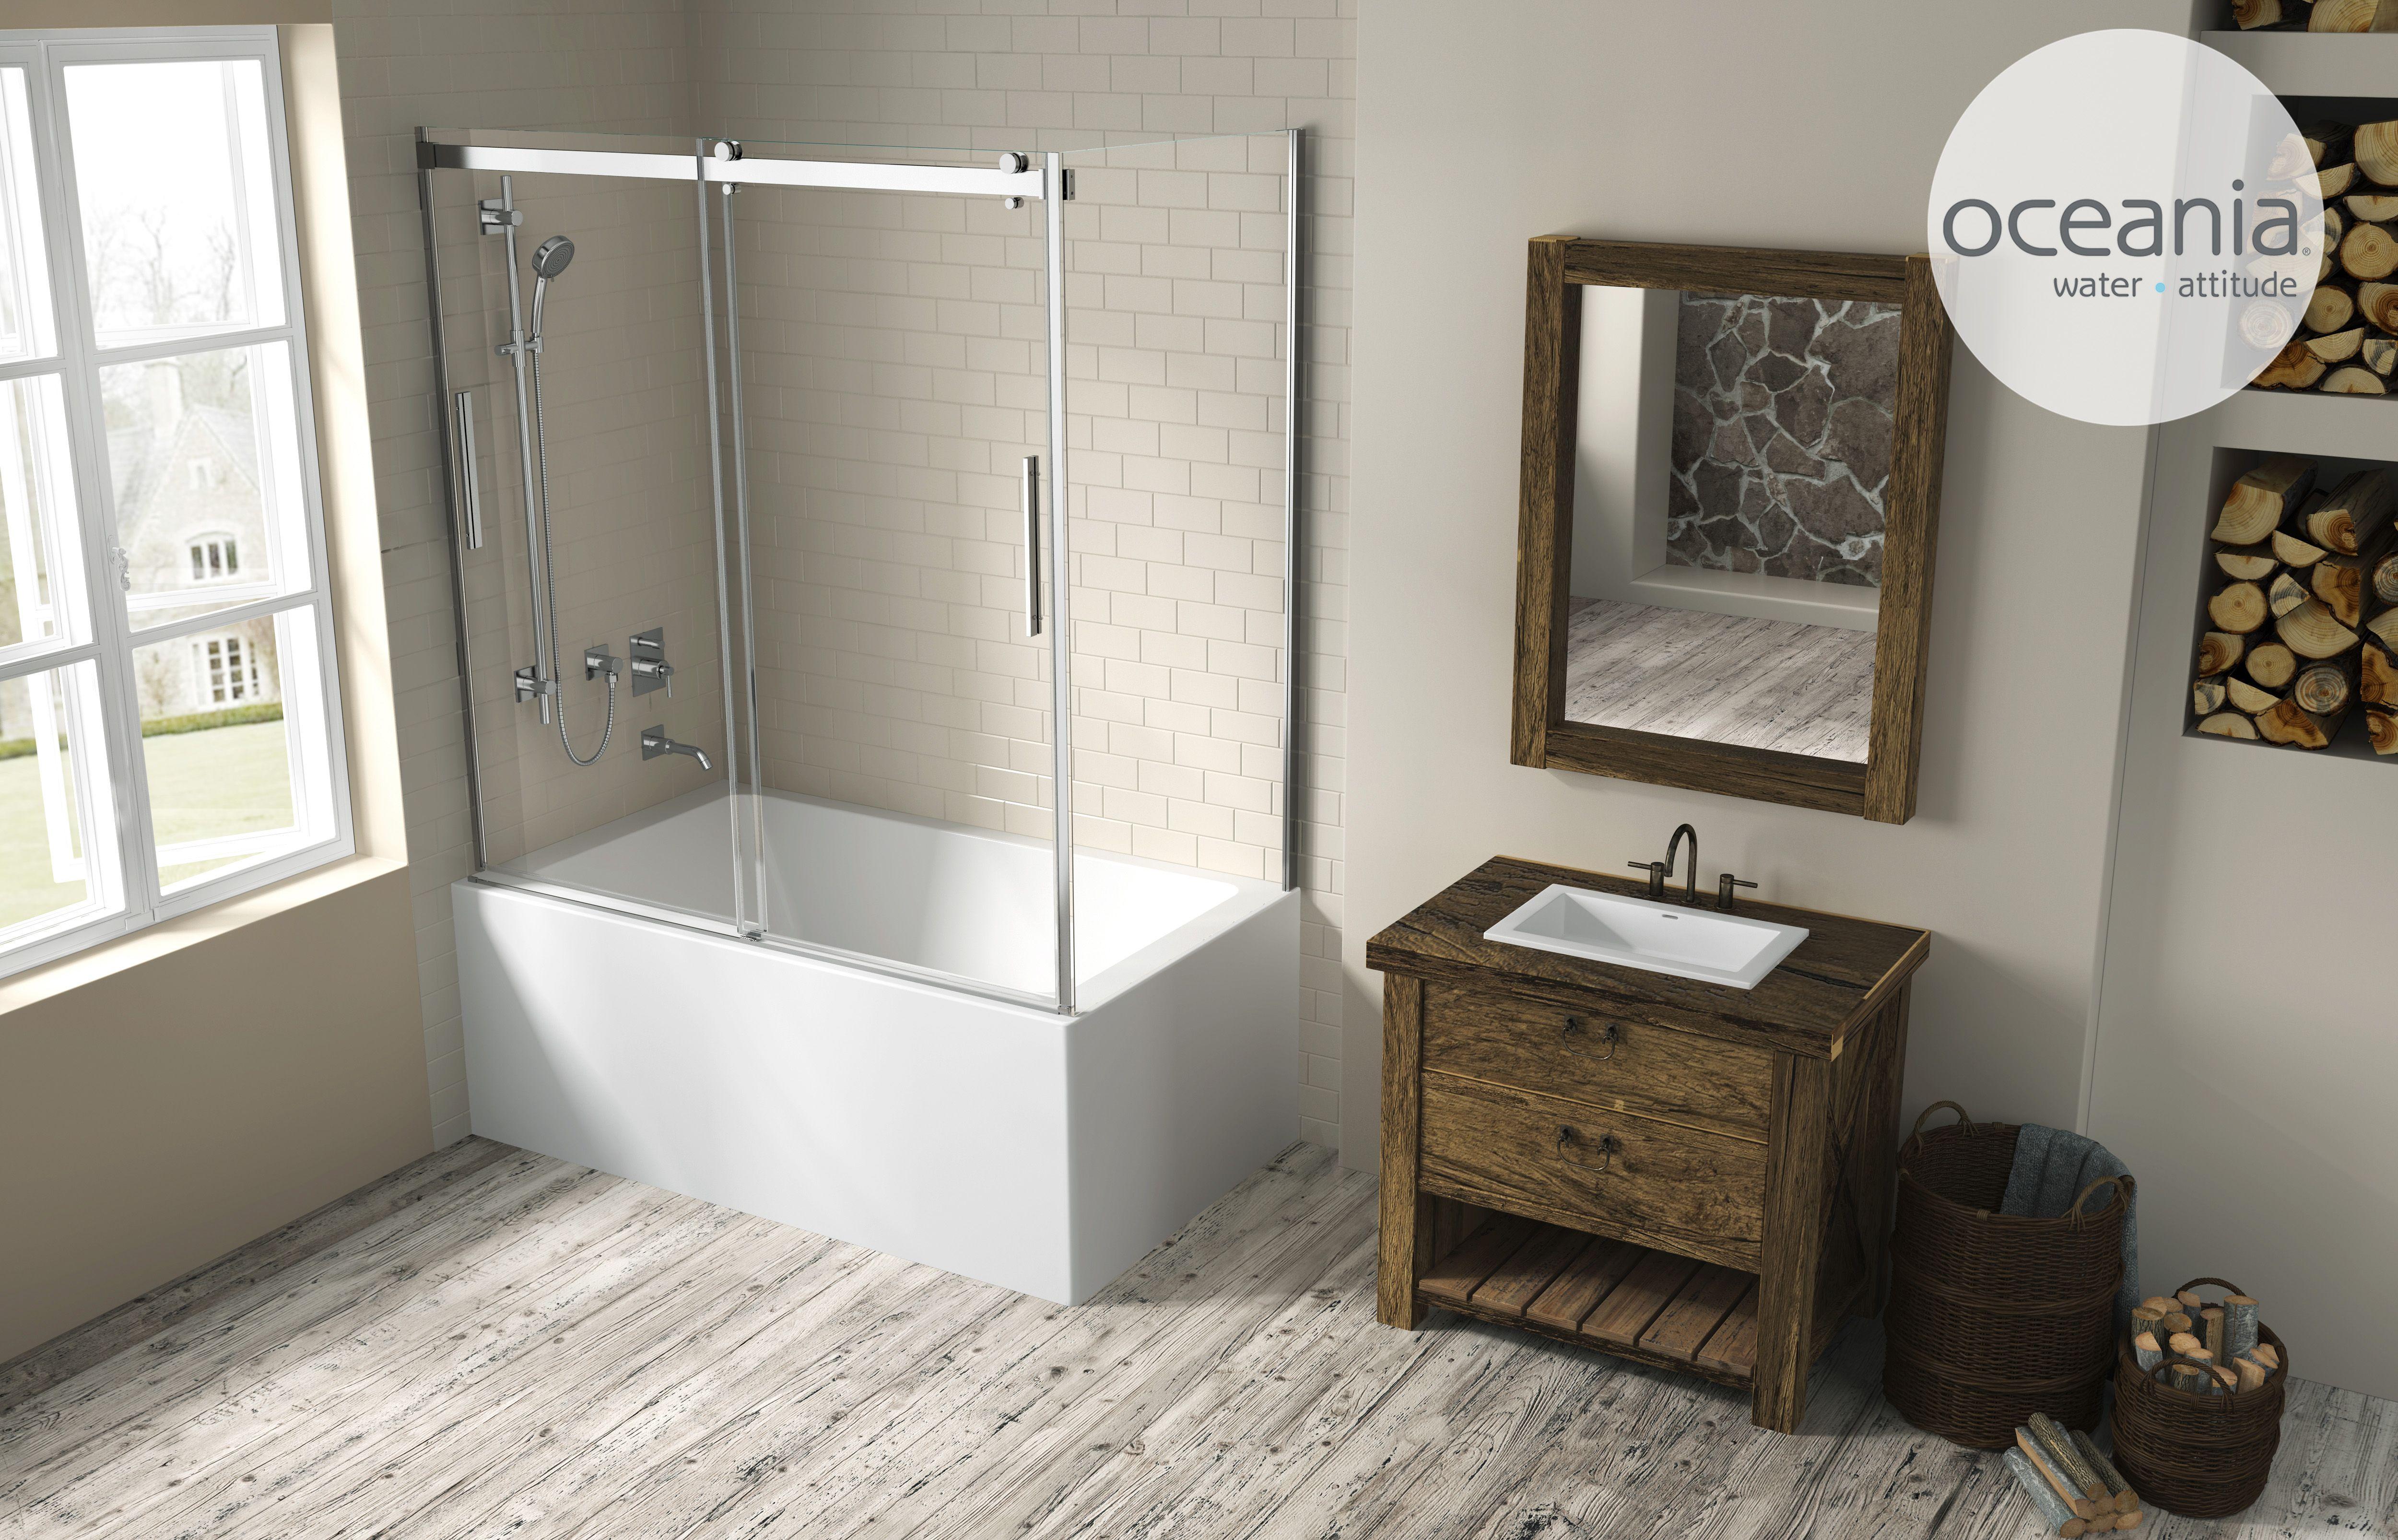 Oceania Bath And Design Bath Door Design De Salle De Bain Salle